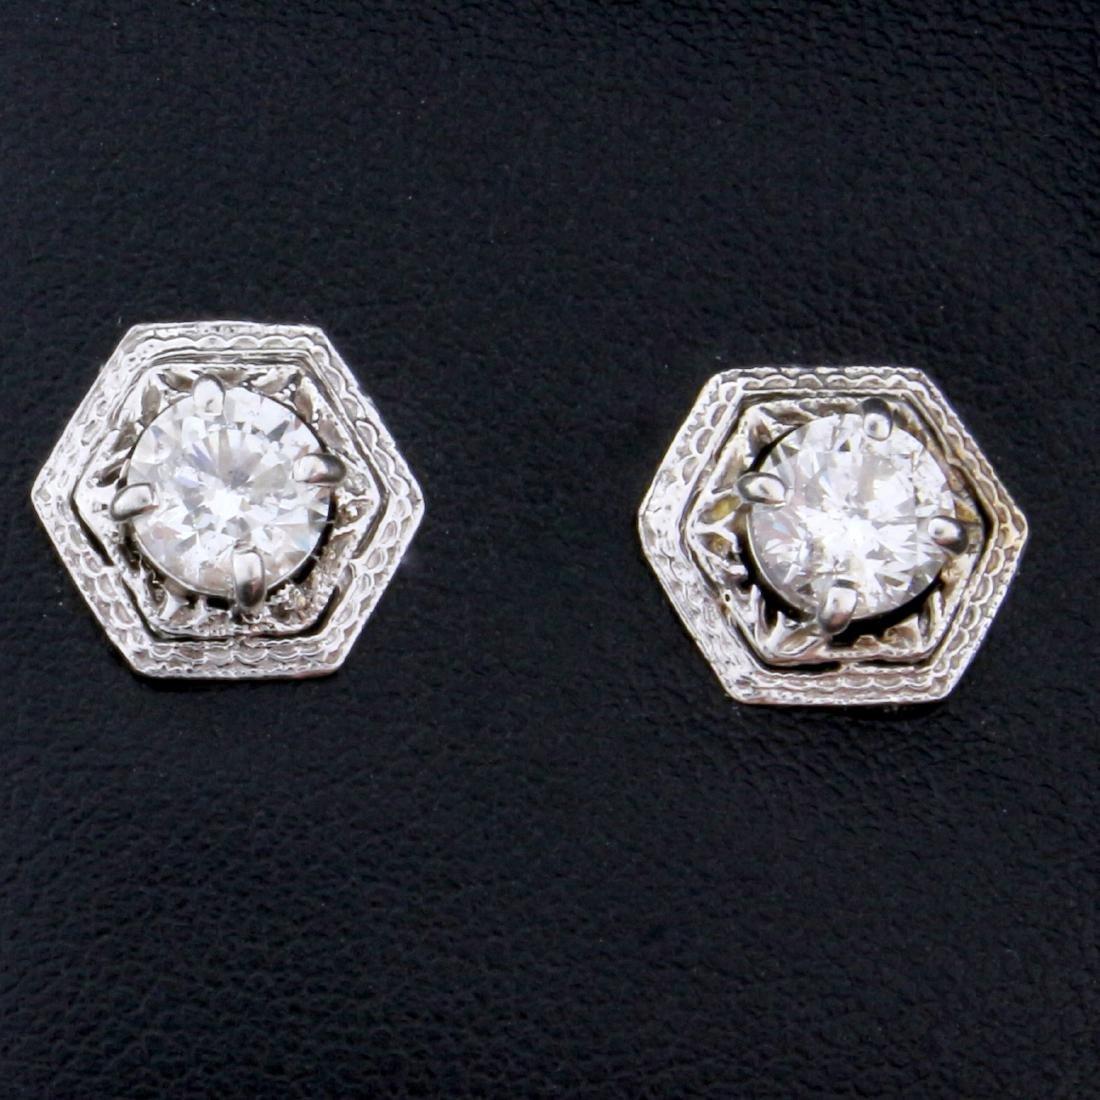 Unique 1.6ct TW Diamond Earrings in 14k White Gold